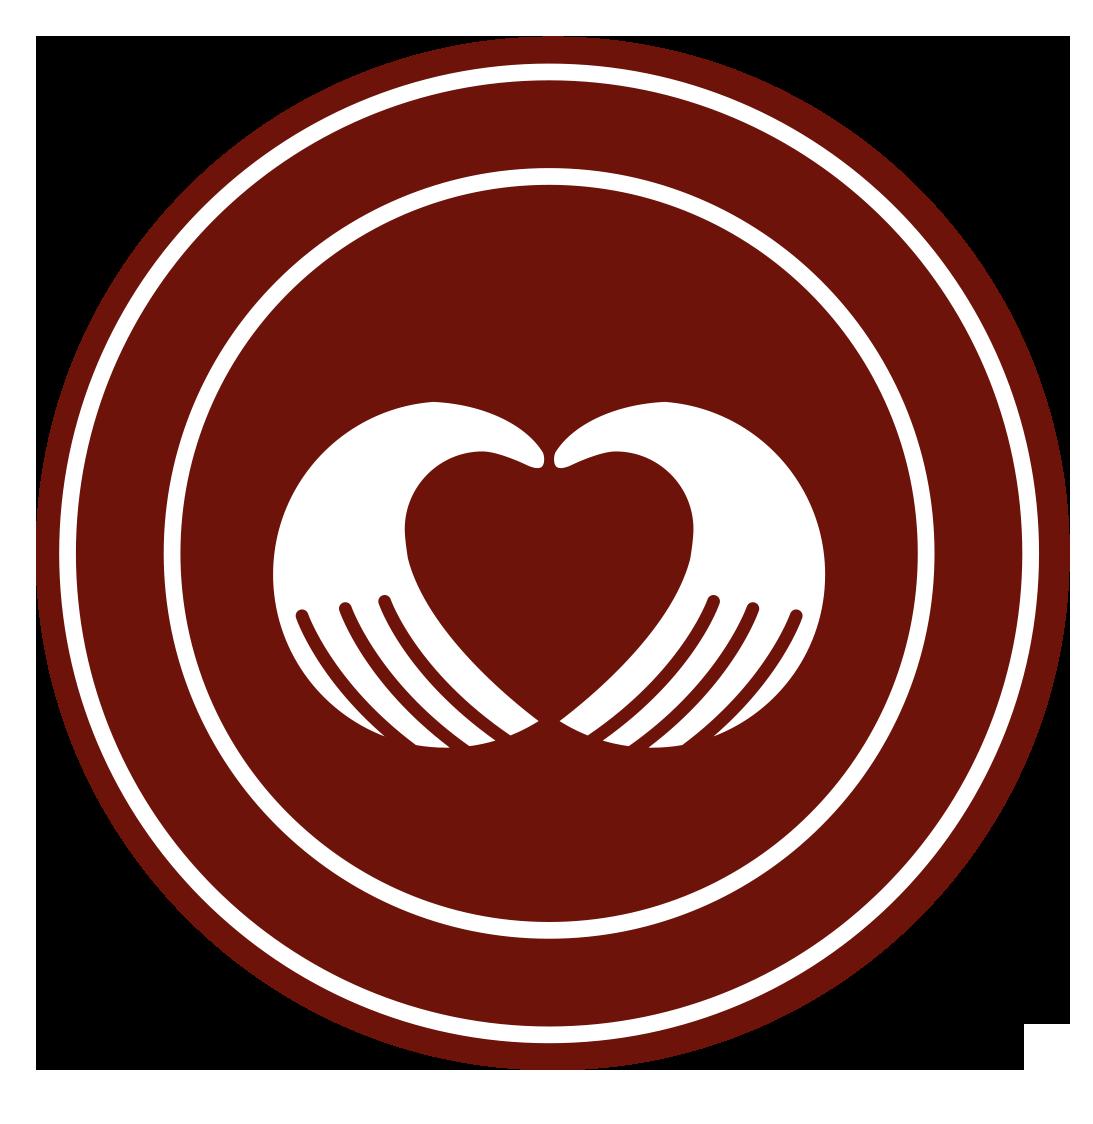 Doctors clipart cardiologist. Inspiring women capital cardiology